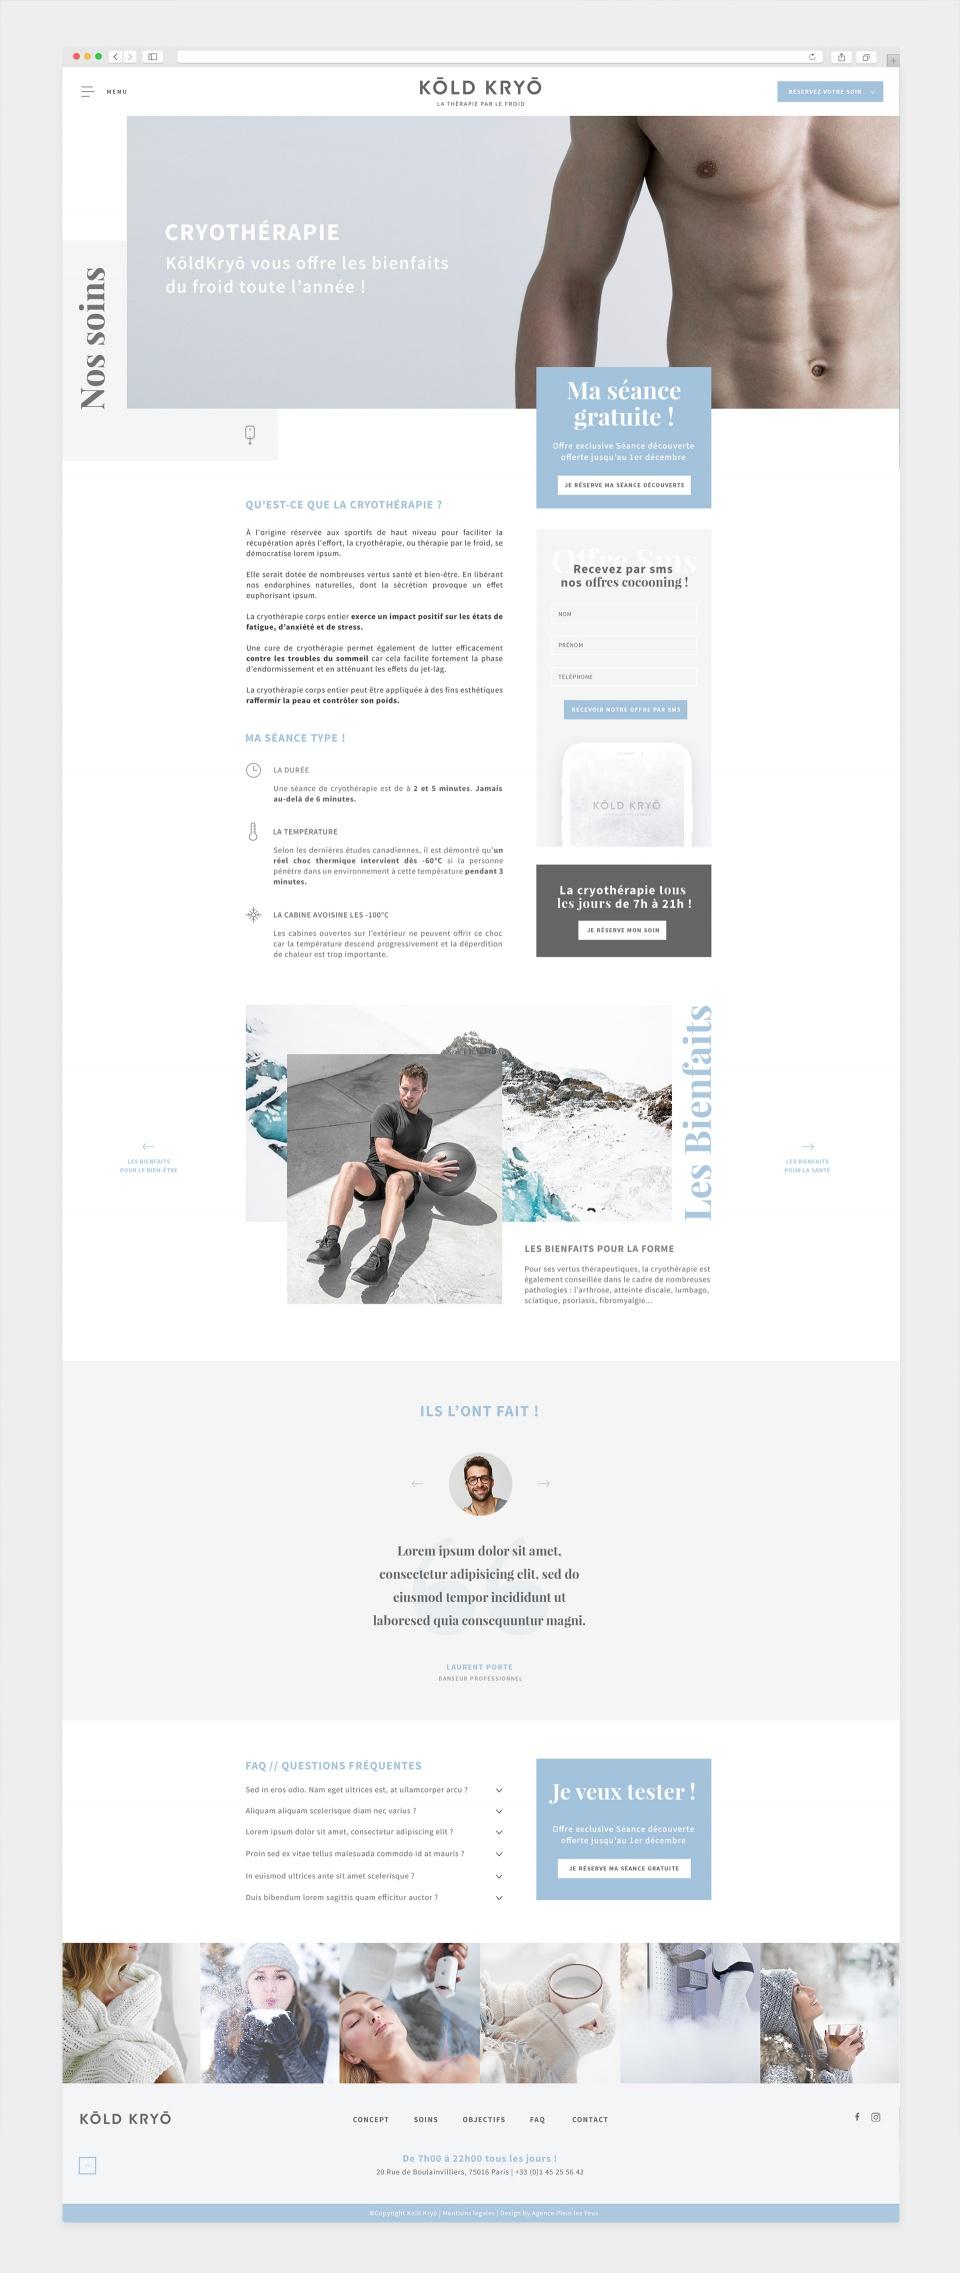 Site — Pages internes